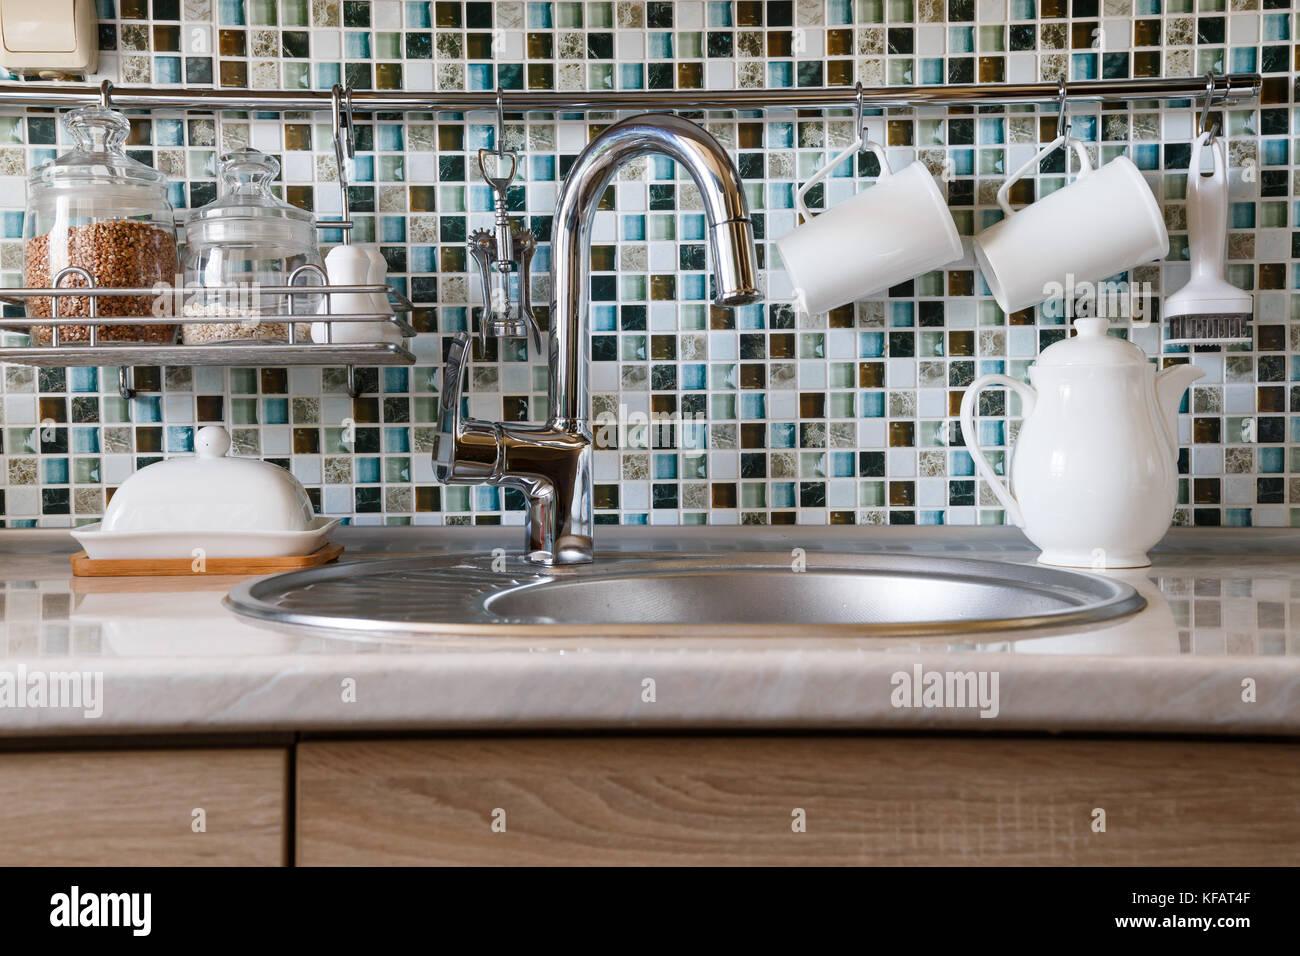 ikea k che katalog pdf mischbatterie waschbecken. Black Bedroom Furniture Sets. Home Design Ideas